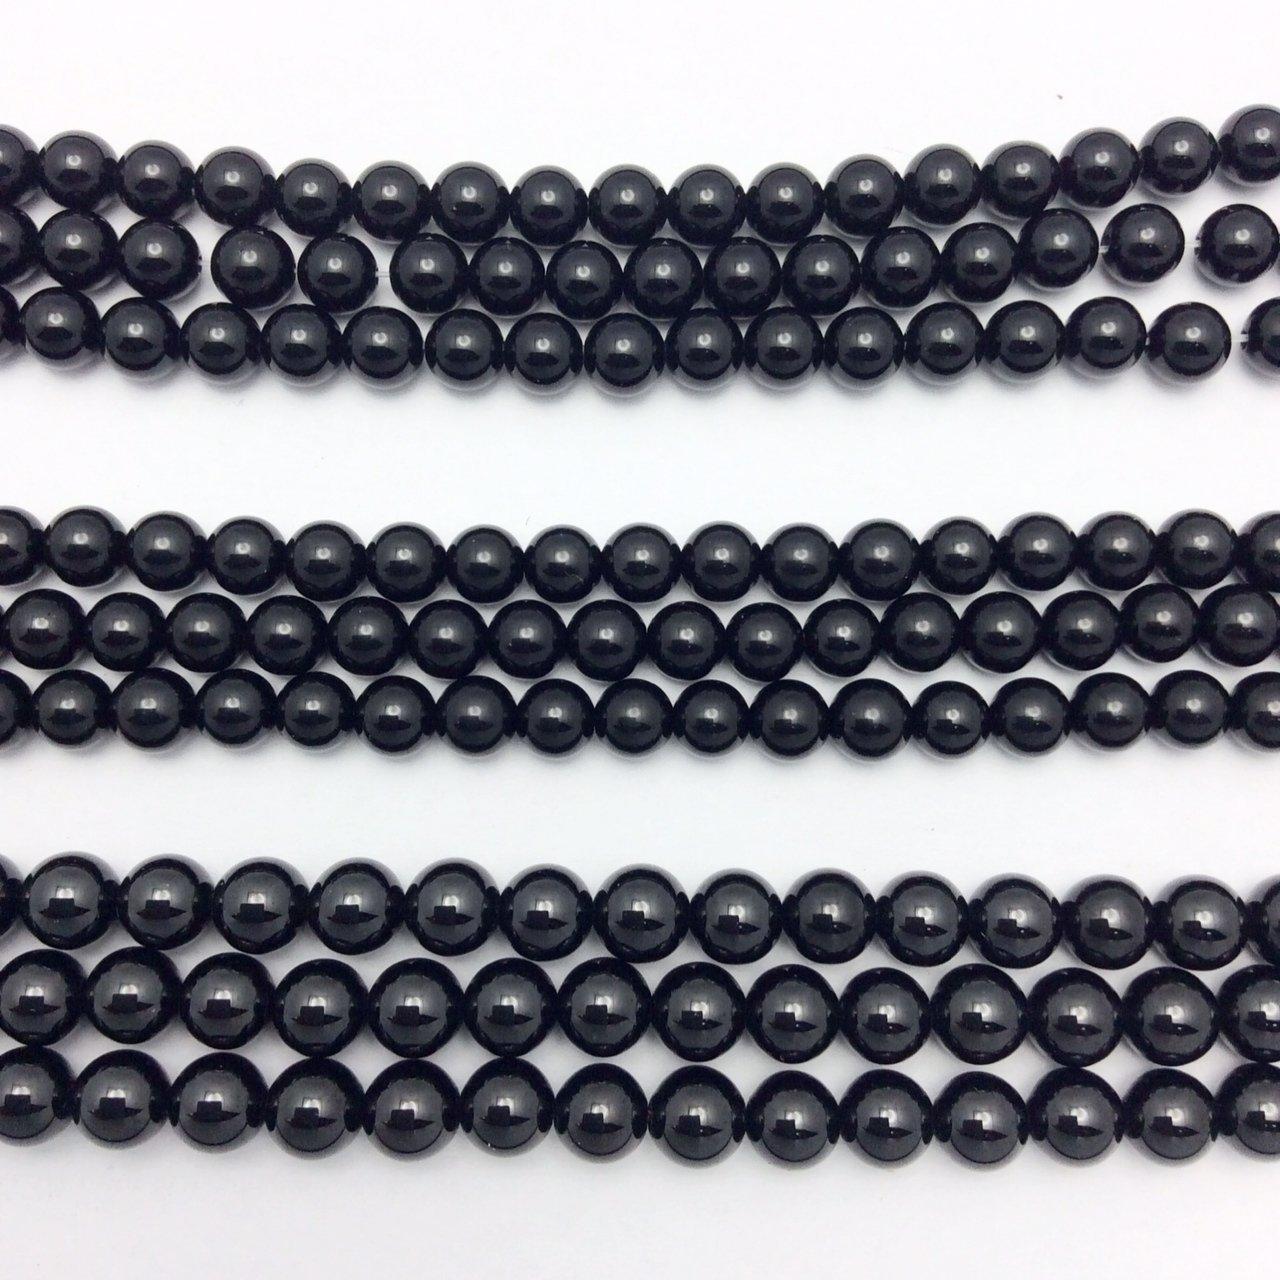 Black Onyx, Black Tourmaline, Black Spinel Beads